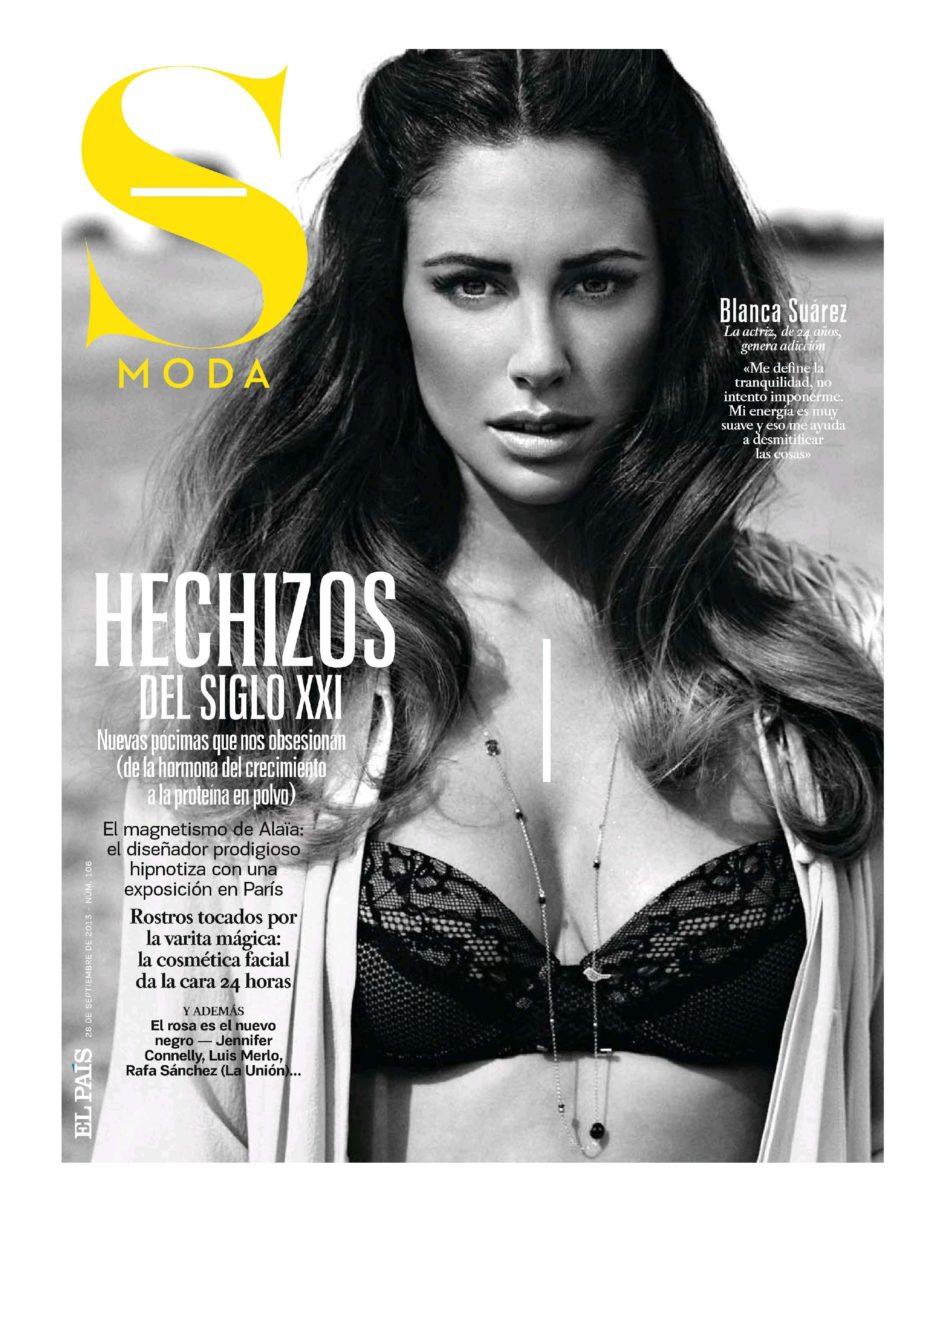 fotos Blanca Suarez desnuda Smoda